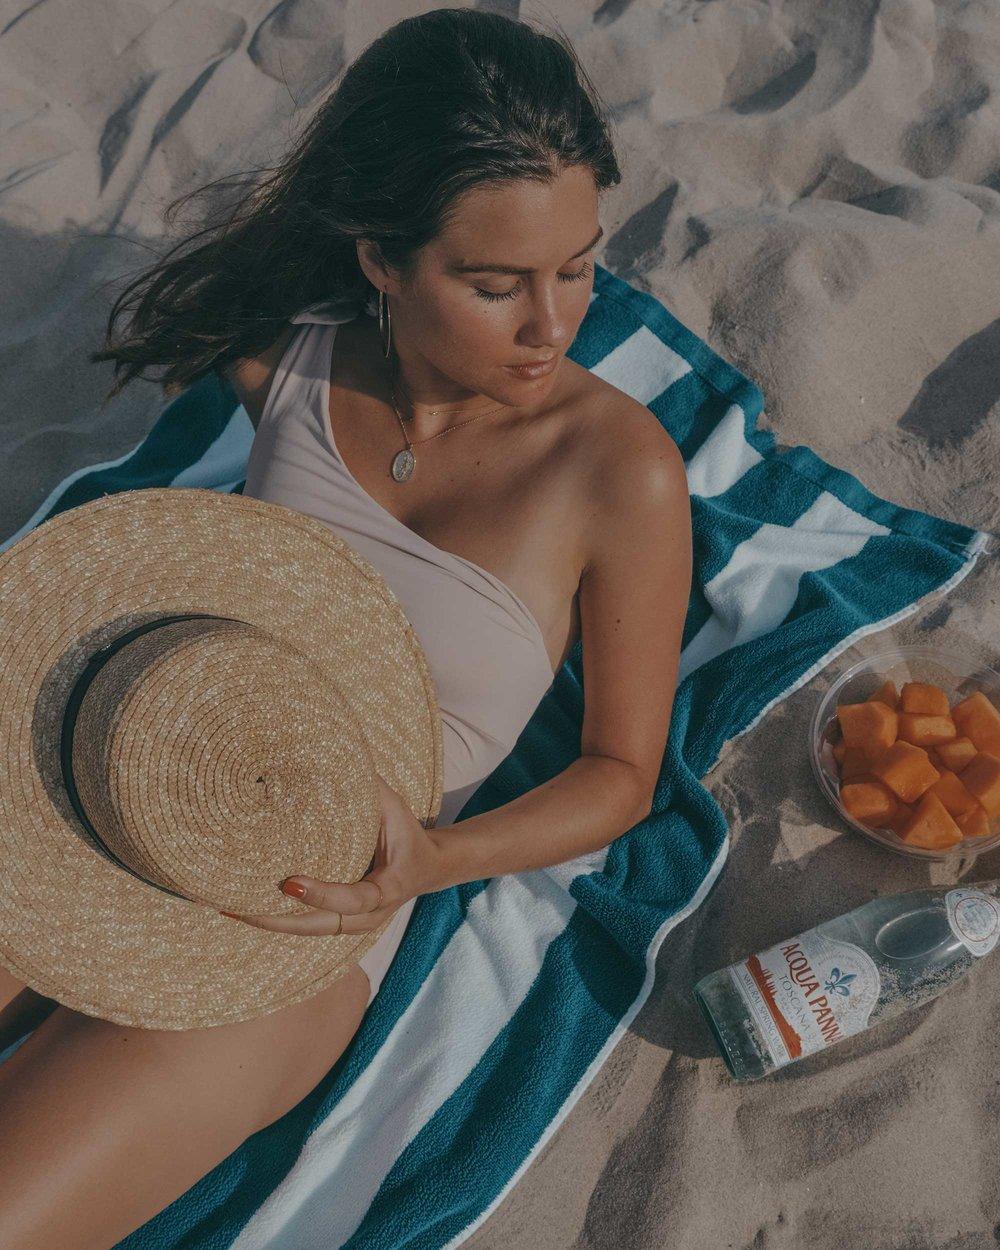 Tavik-Kenton-Asymmetrical-one-shoulder-one-piece-Newport-Beach-california-summer1.jpg